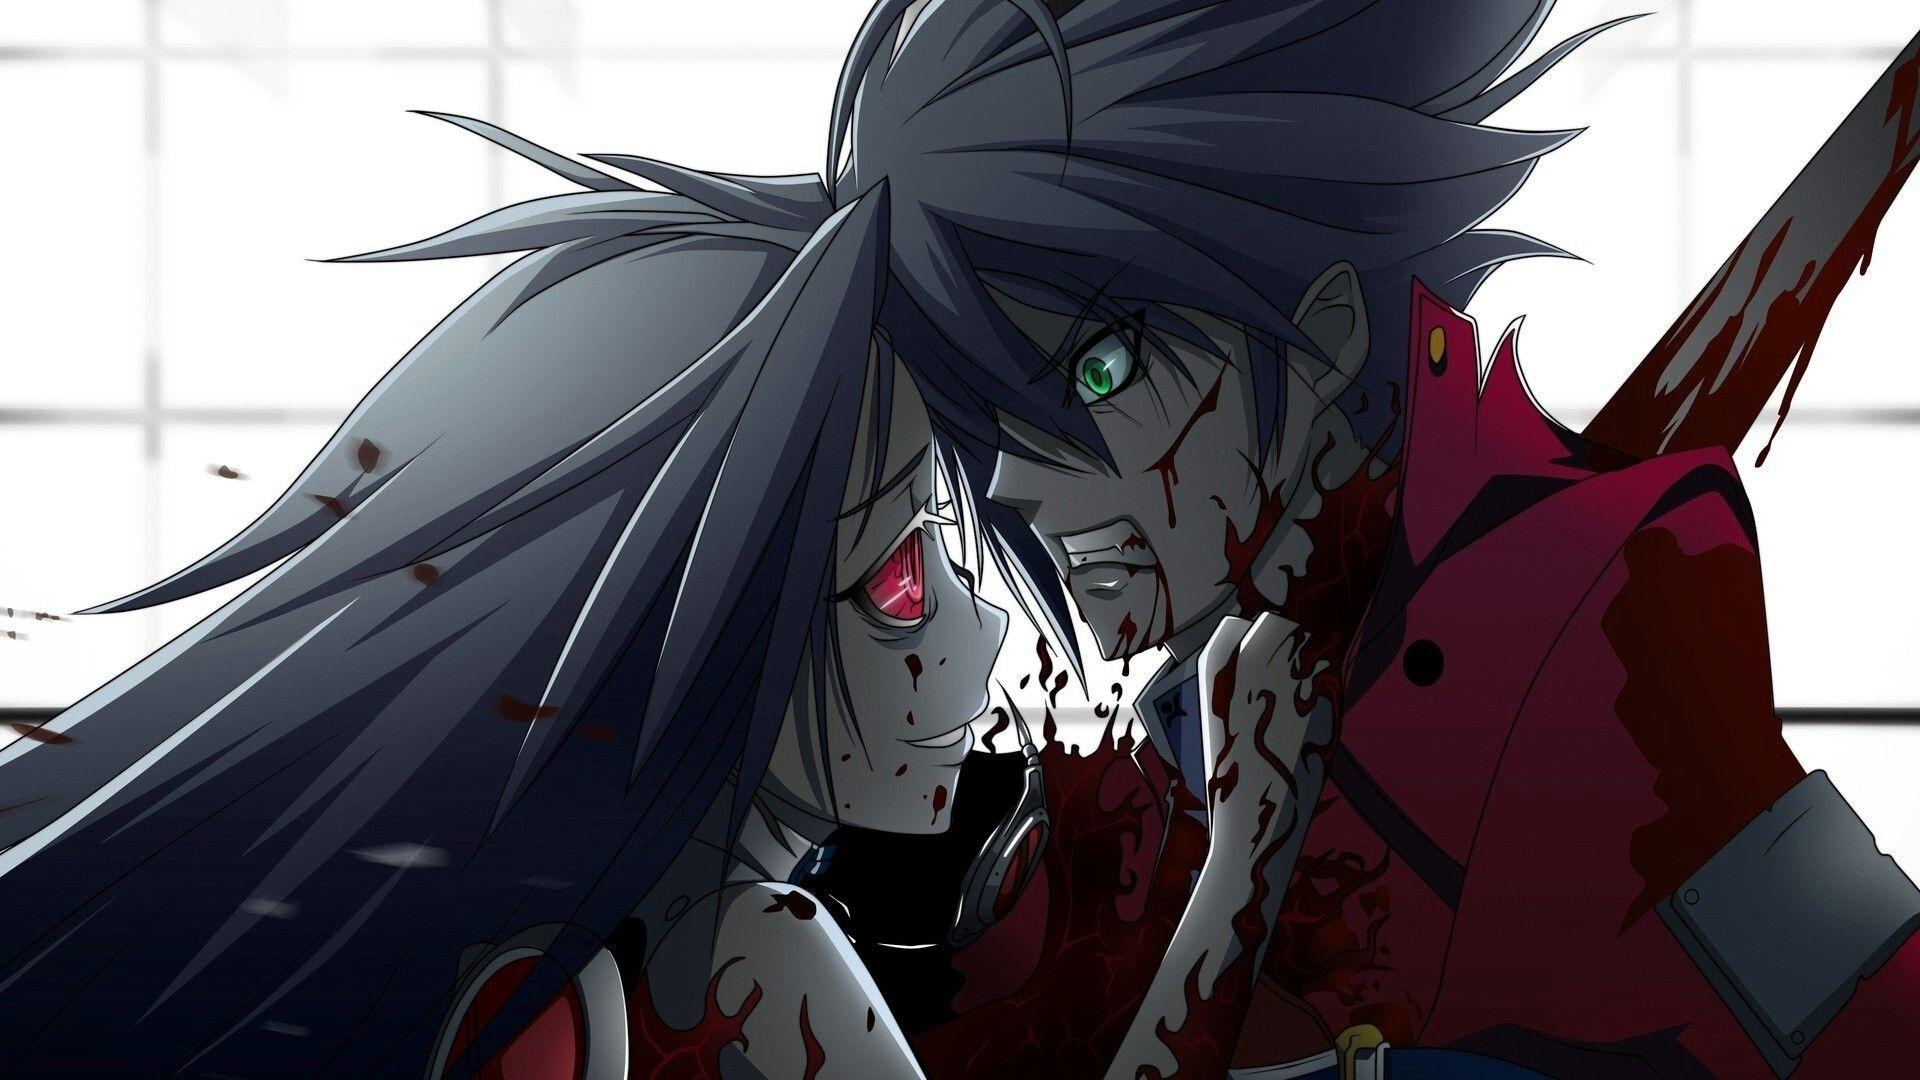 I love blood 00splatter anime blutige anime figur